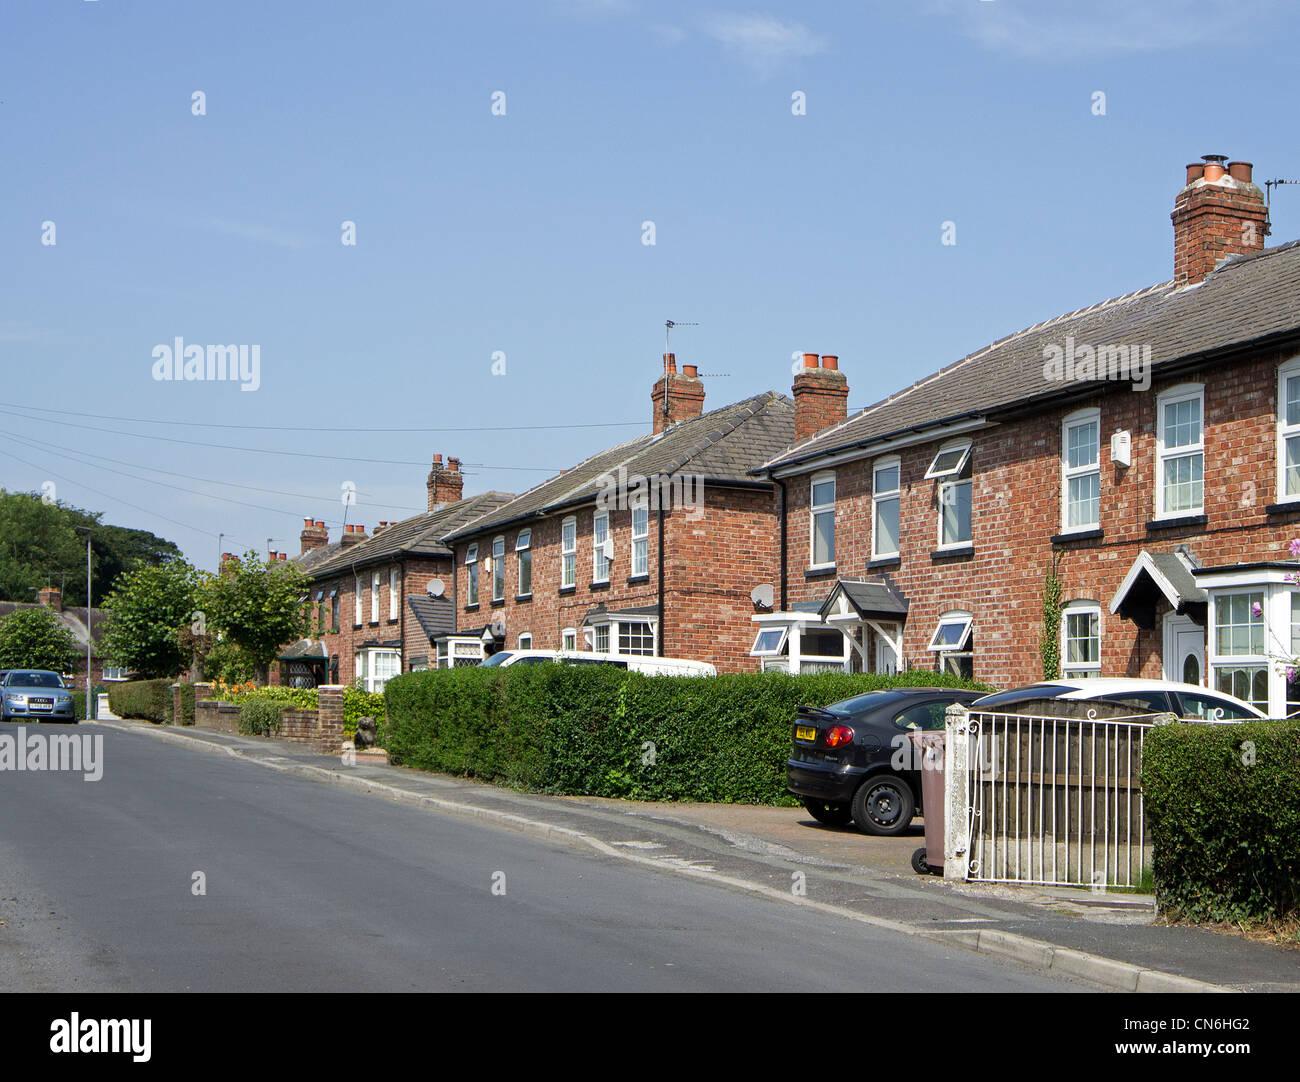 Una tranquila calle suburbana cerca de Manchester, Reino Unido Imagen De Stock